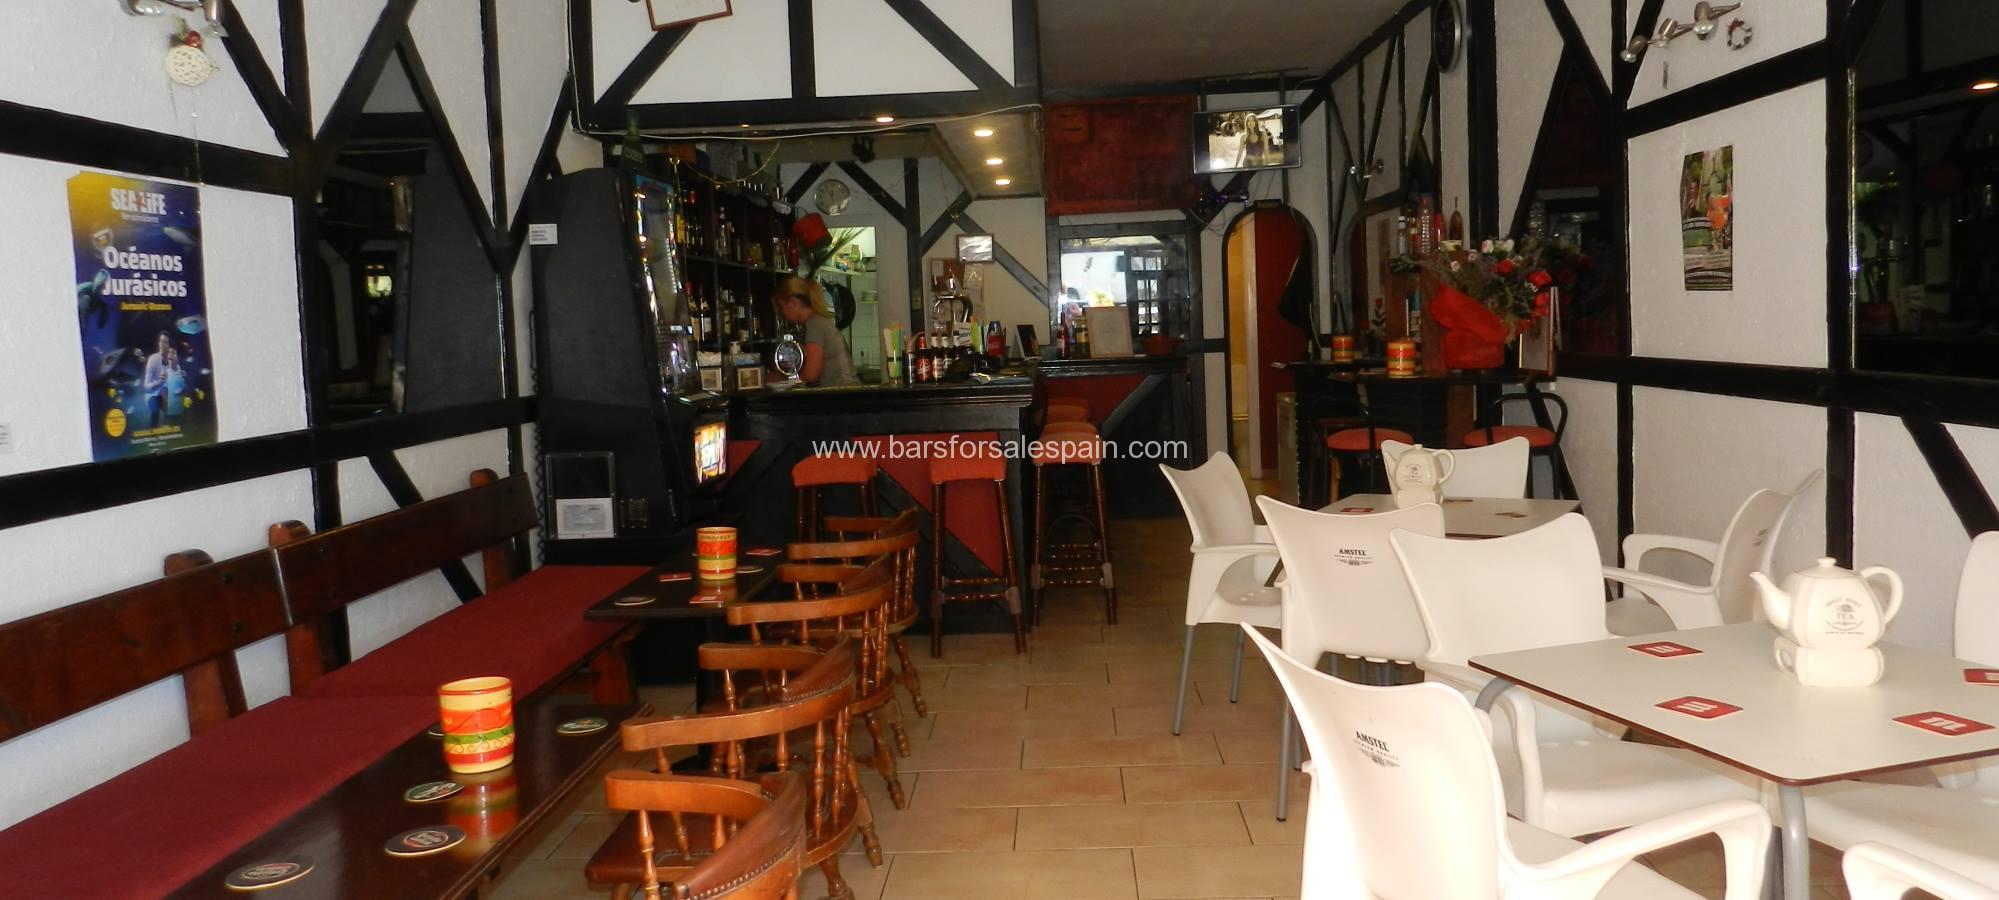 Cafe Bar For Lease in Benalmadena, Malaga, Spain